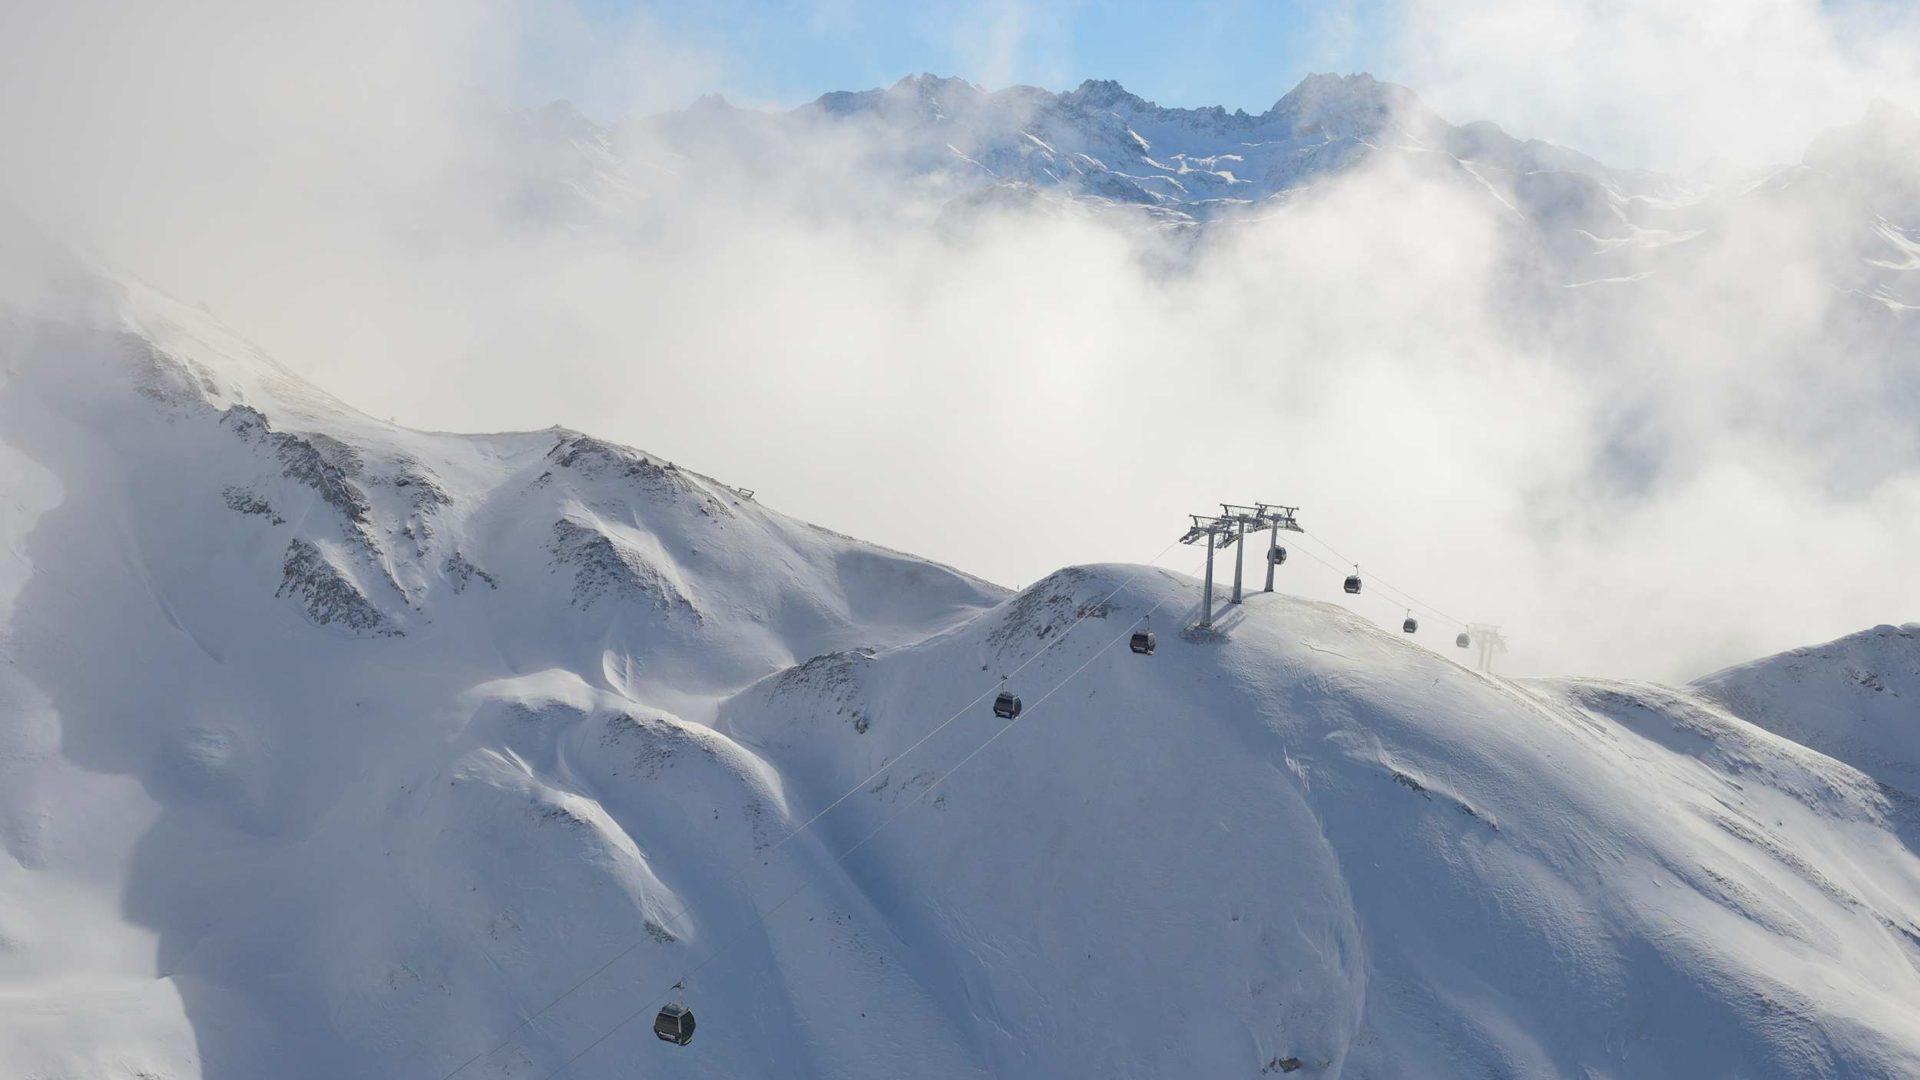 Flexenbahn, Lech Zürs am Arlberg (c) Ski Arlberg